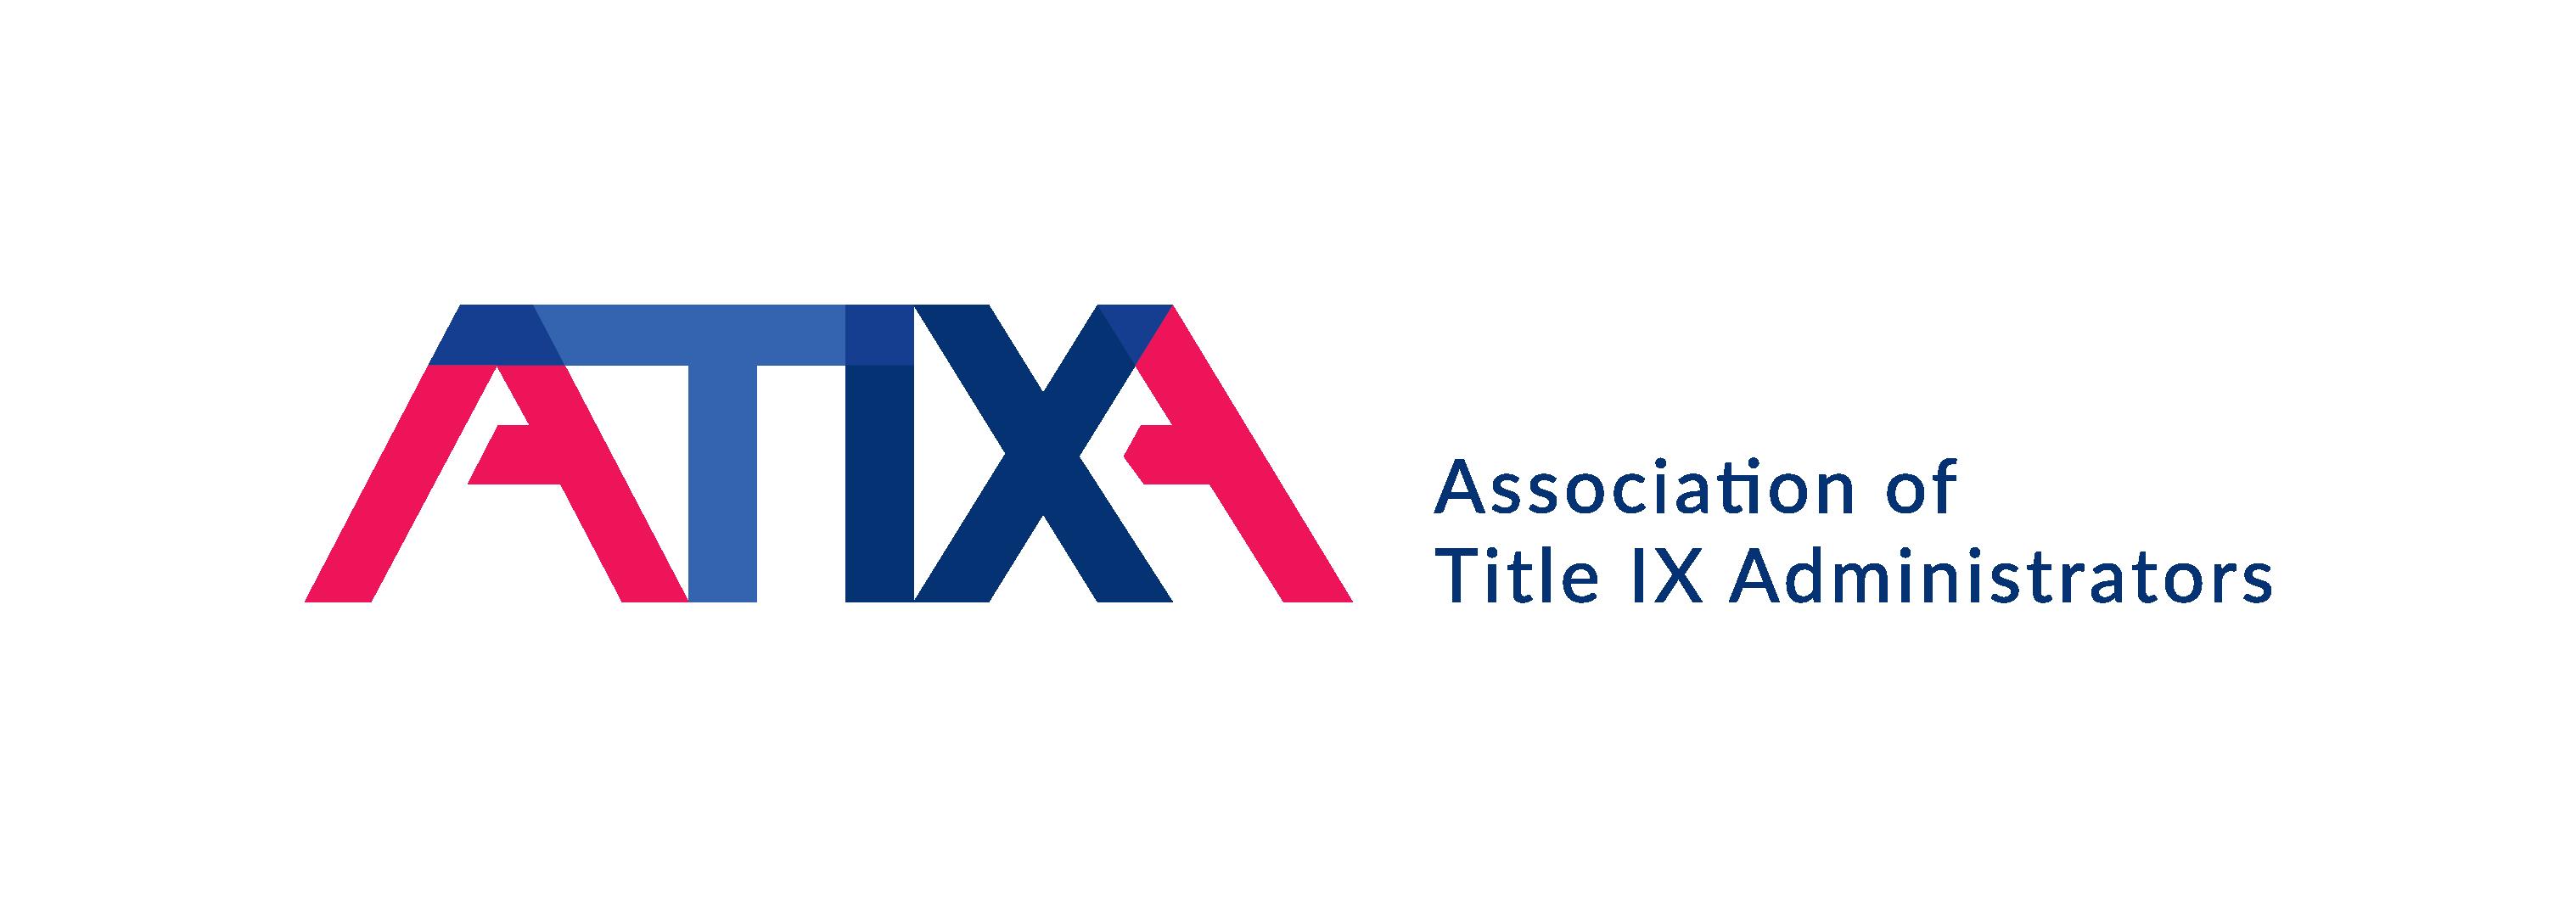 ATIXA-WithTagline-CMYK-FullColor